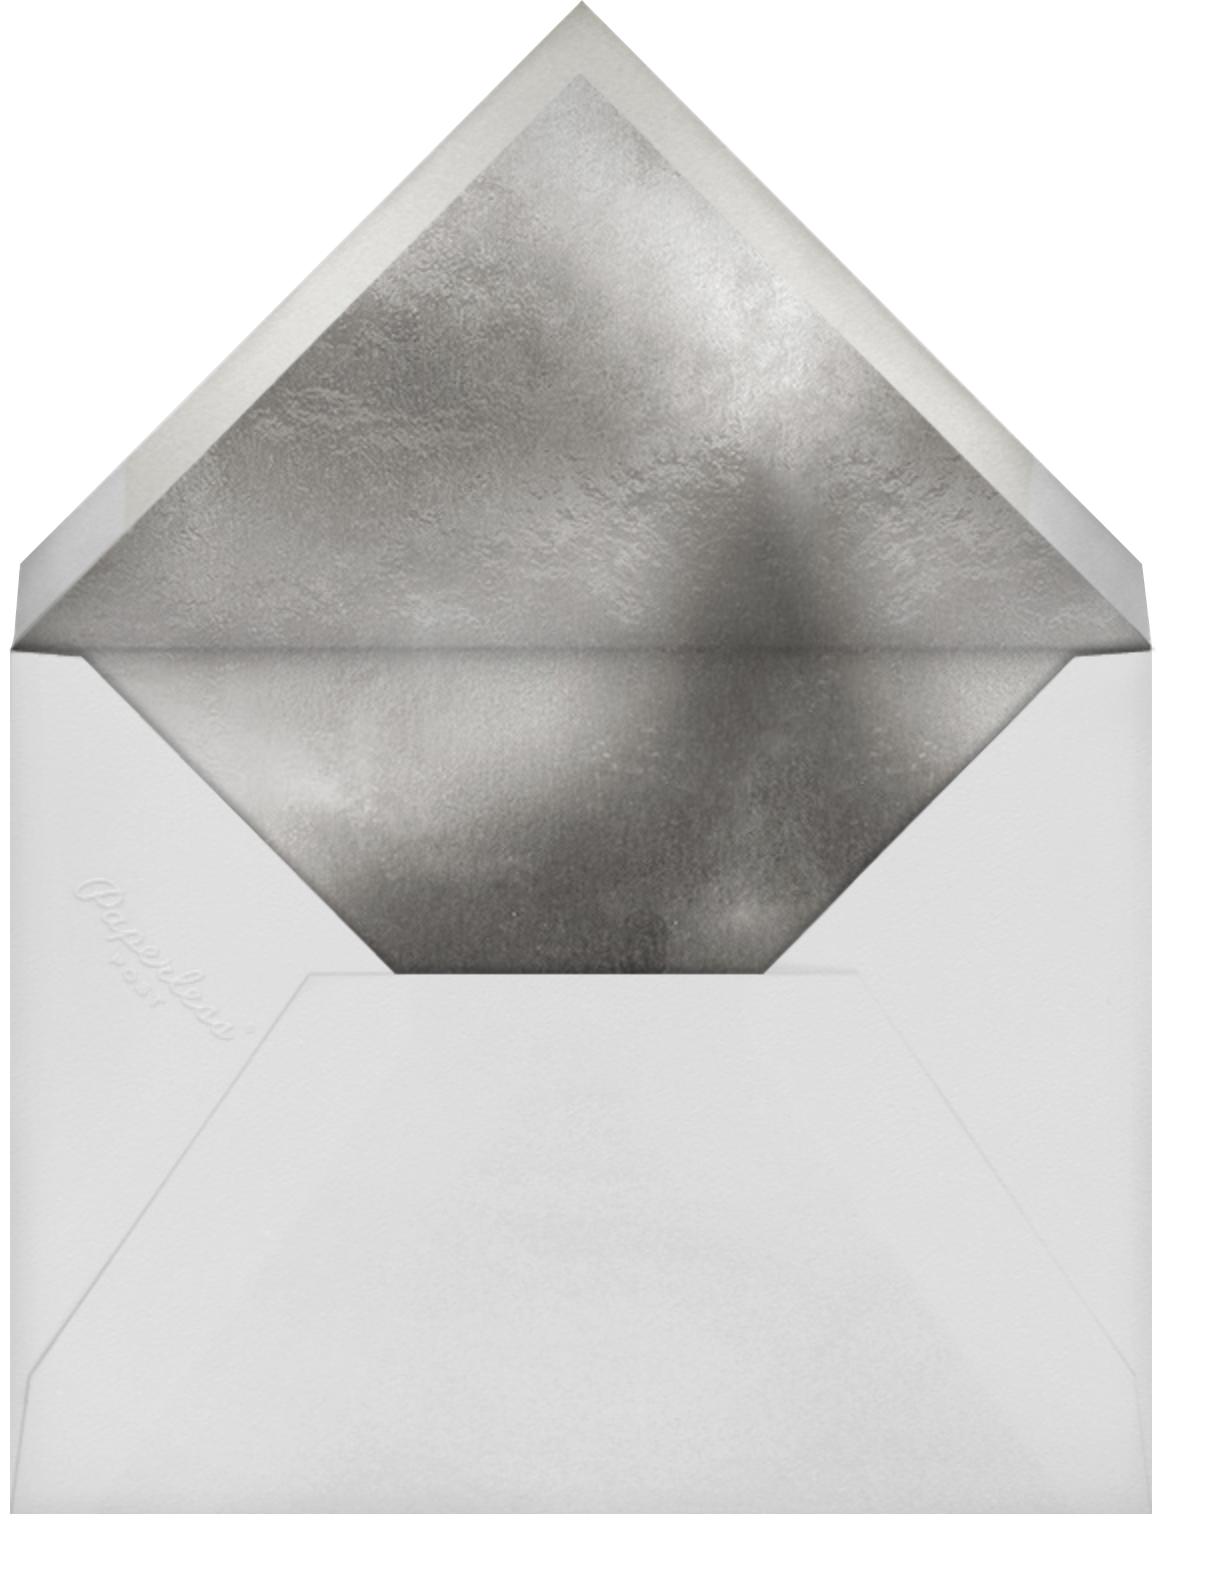 Buddding Vine (Invitation) - Meringue - Rifle Paper Co. - All - envelope back